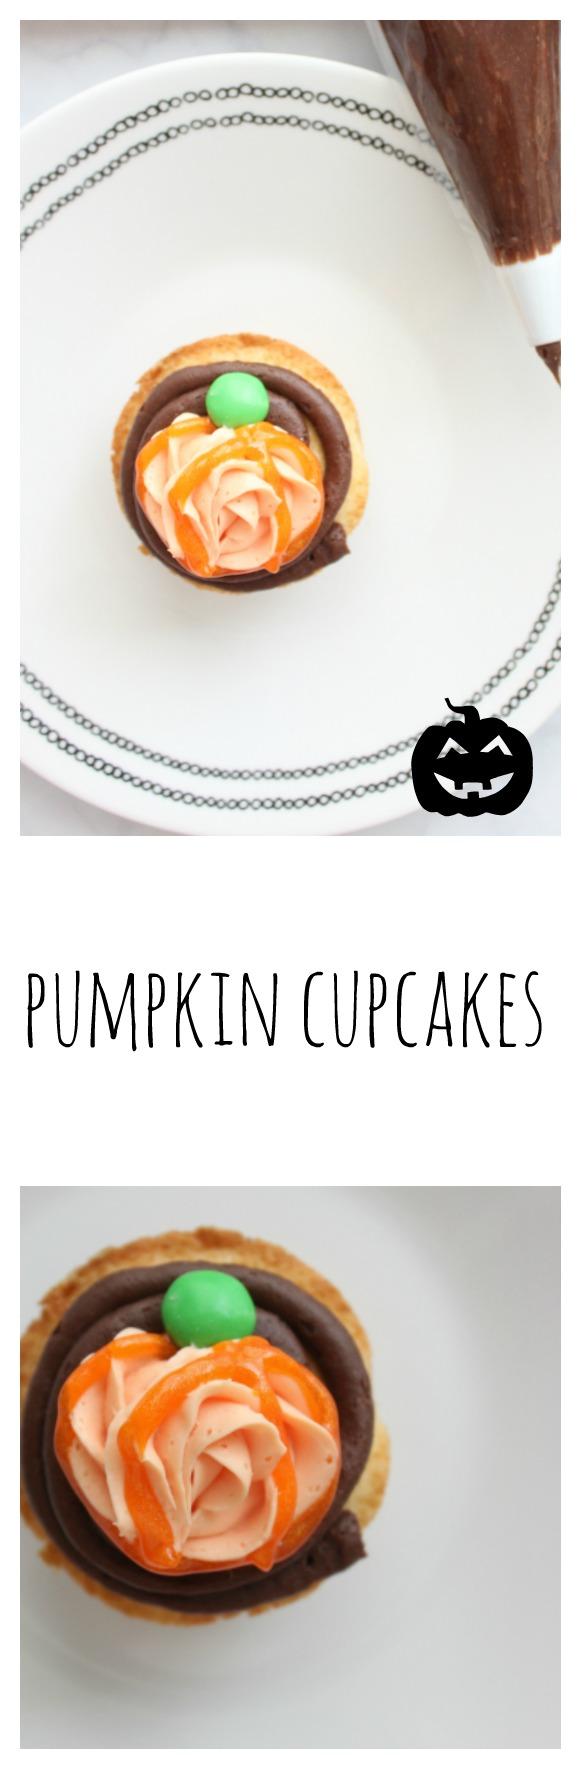 pumpkin-cupcakes-easy-to-make